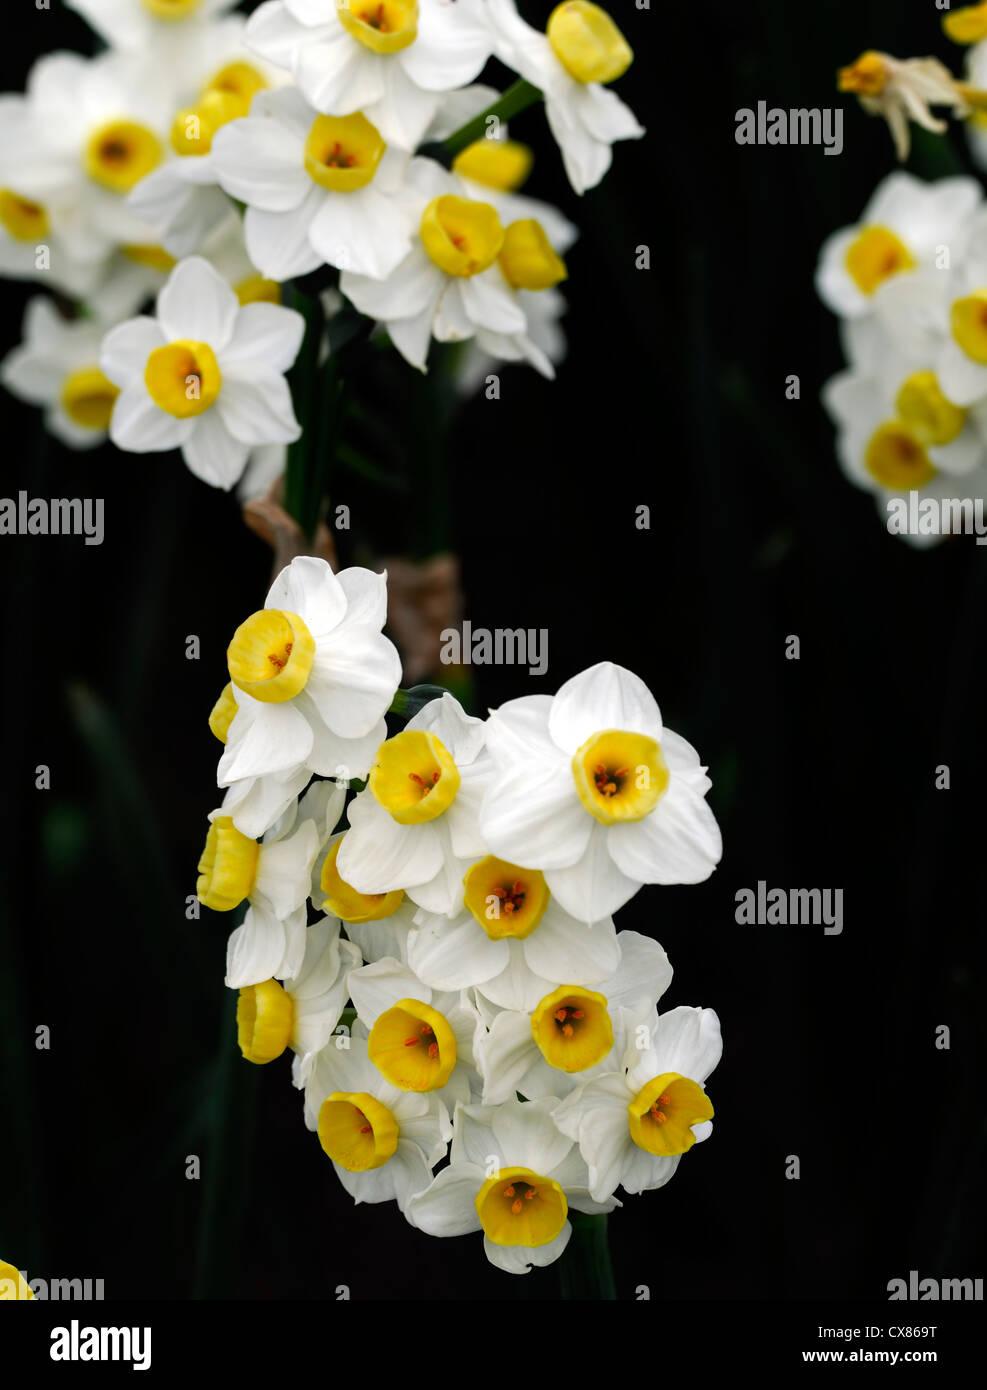 Daffodil Geranium Stock Photos Daffodil Geranium Stock Images Alamy